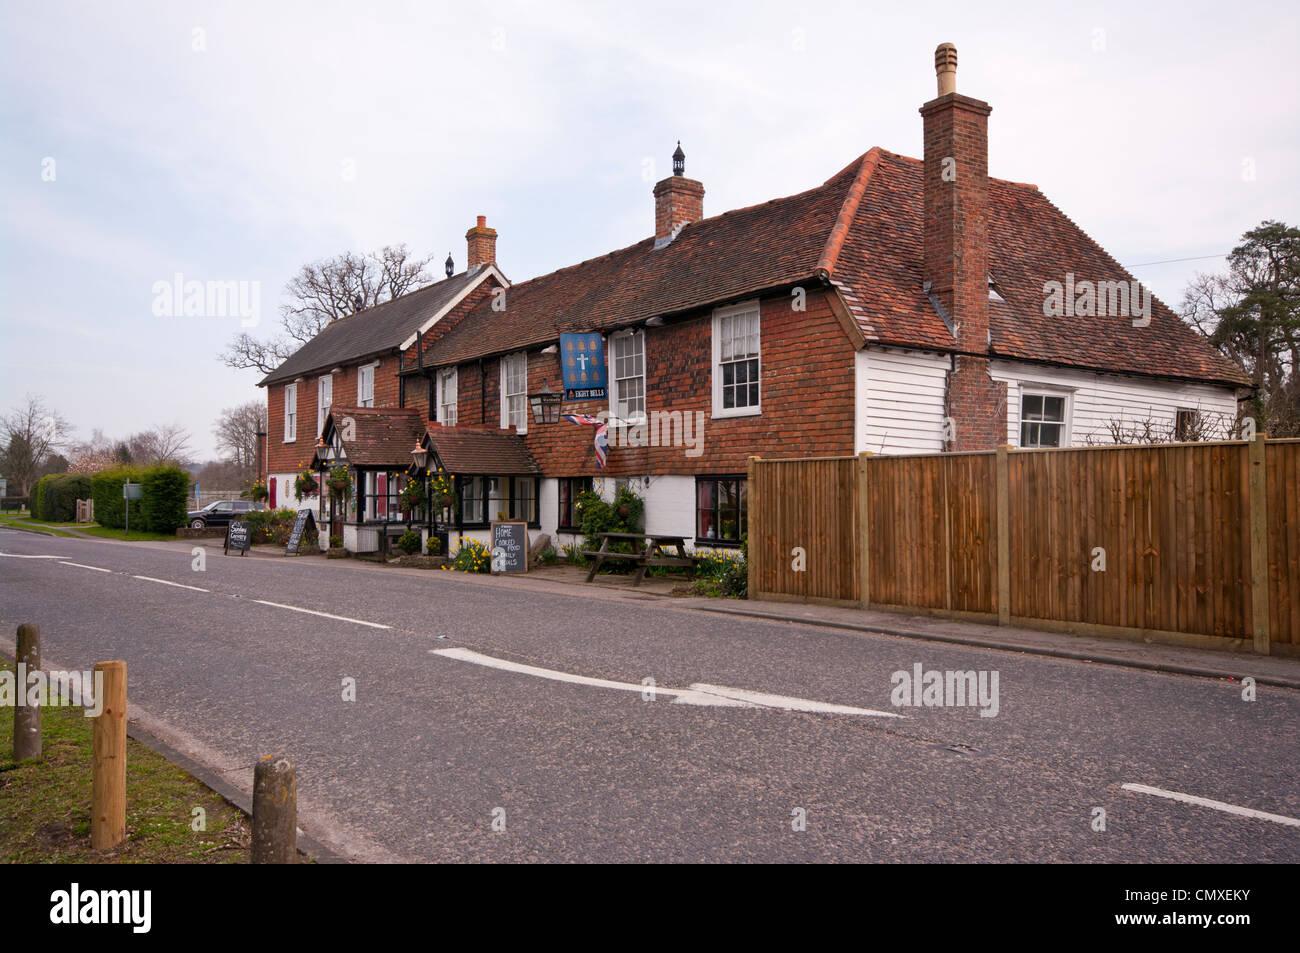 The Eight Bells Village Pub Hawkhurst Kent Uk Pubs - Stock Image